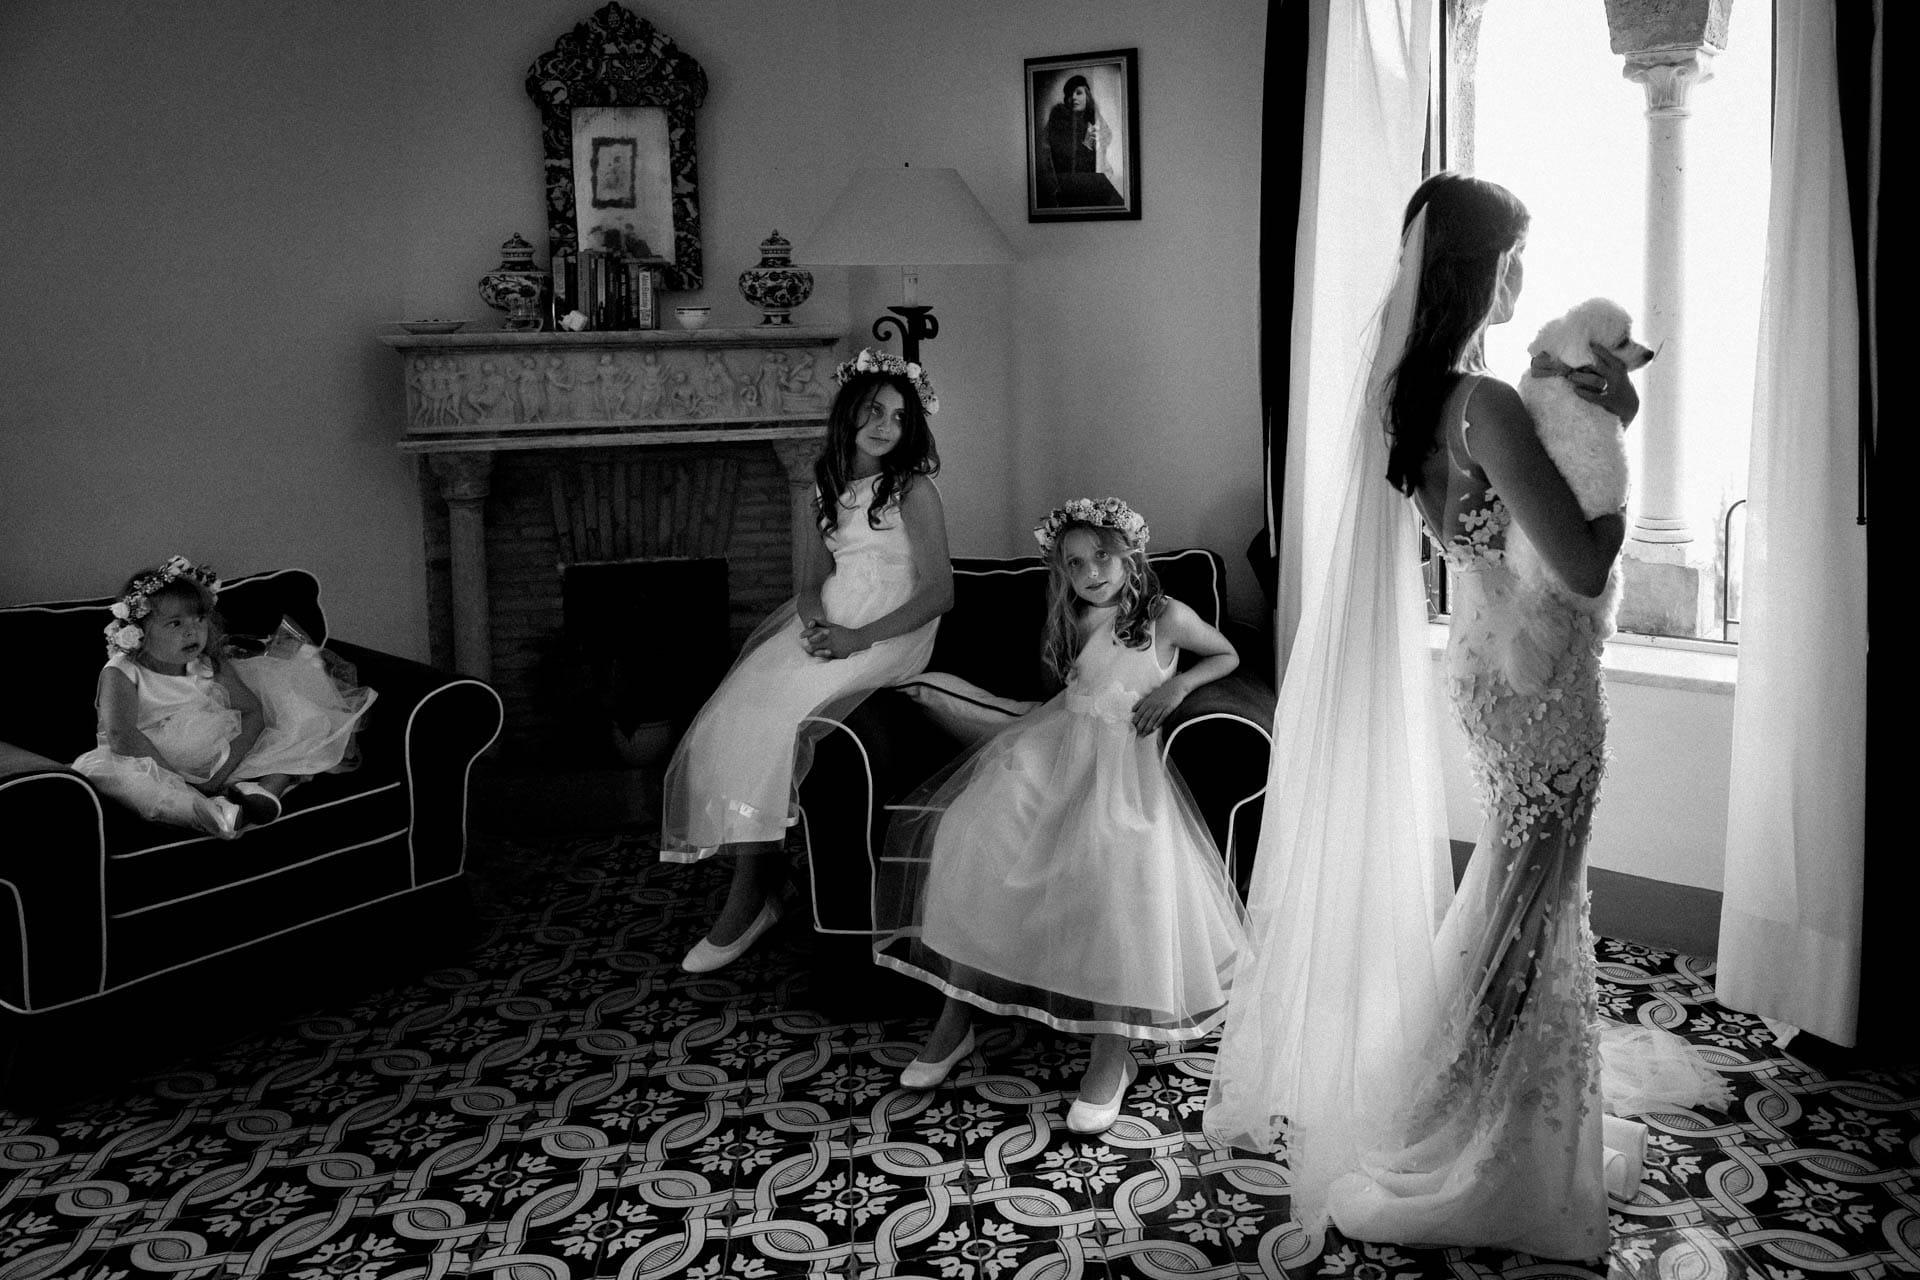 fairytales wedding capri